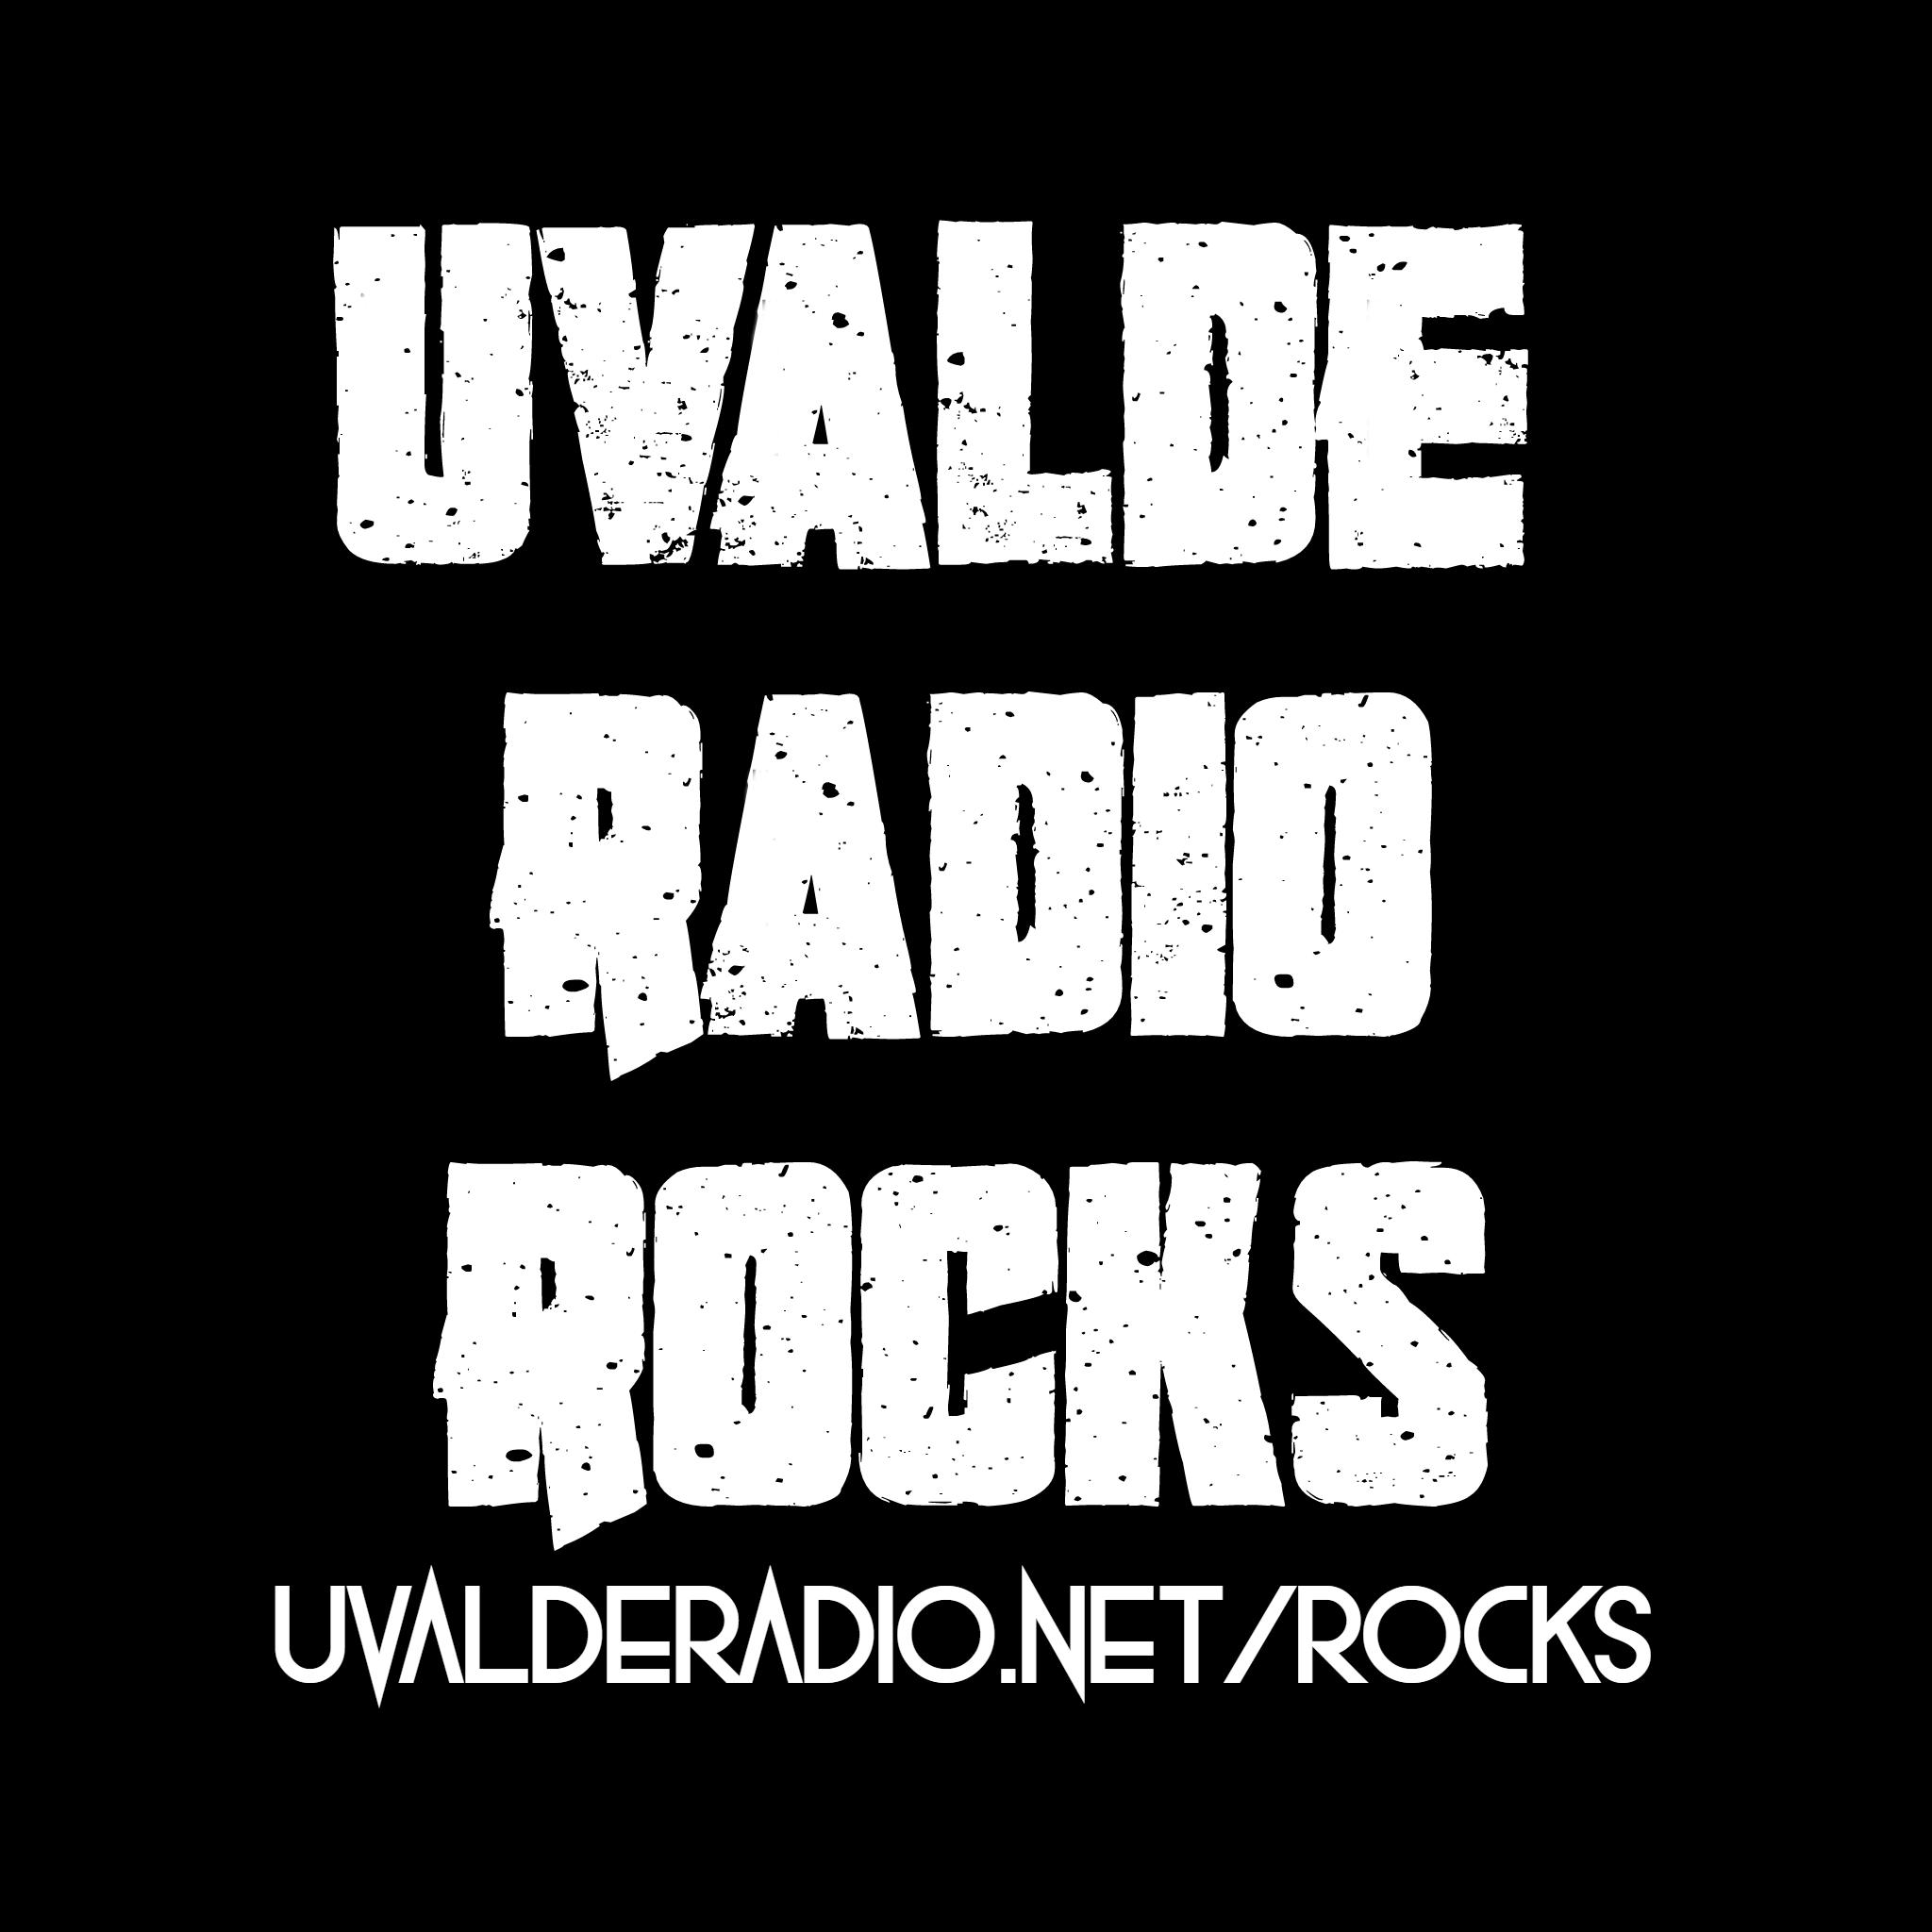 Art for ROCKIN' SW TEXAS & THE WORLD by UVALDE RADIO ROCKS